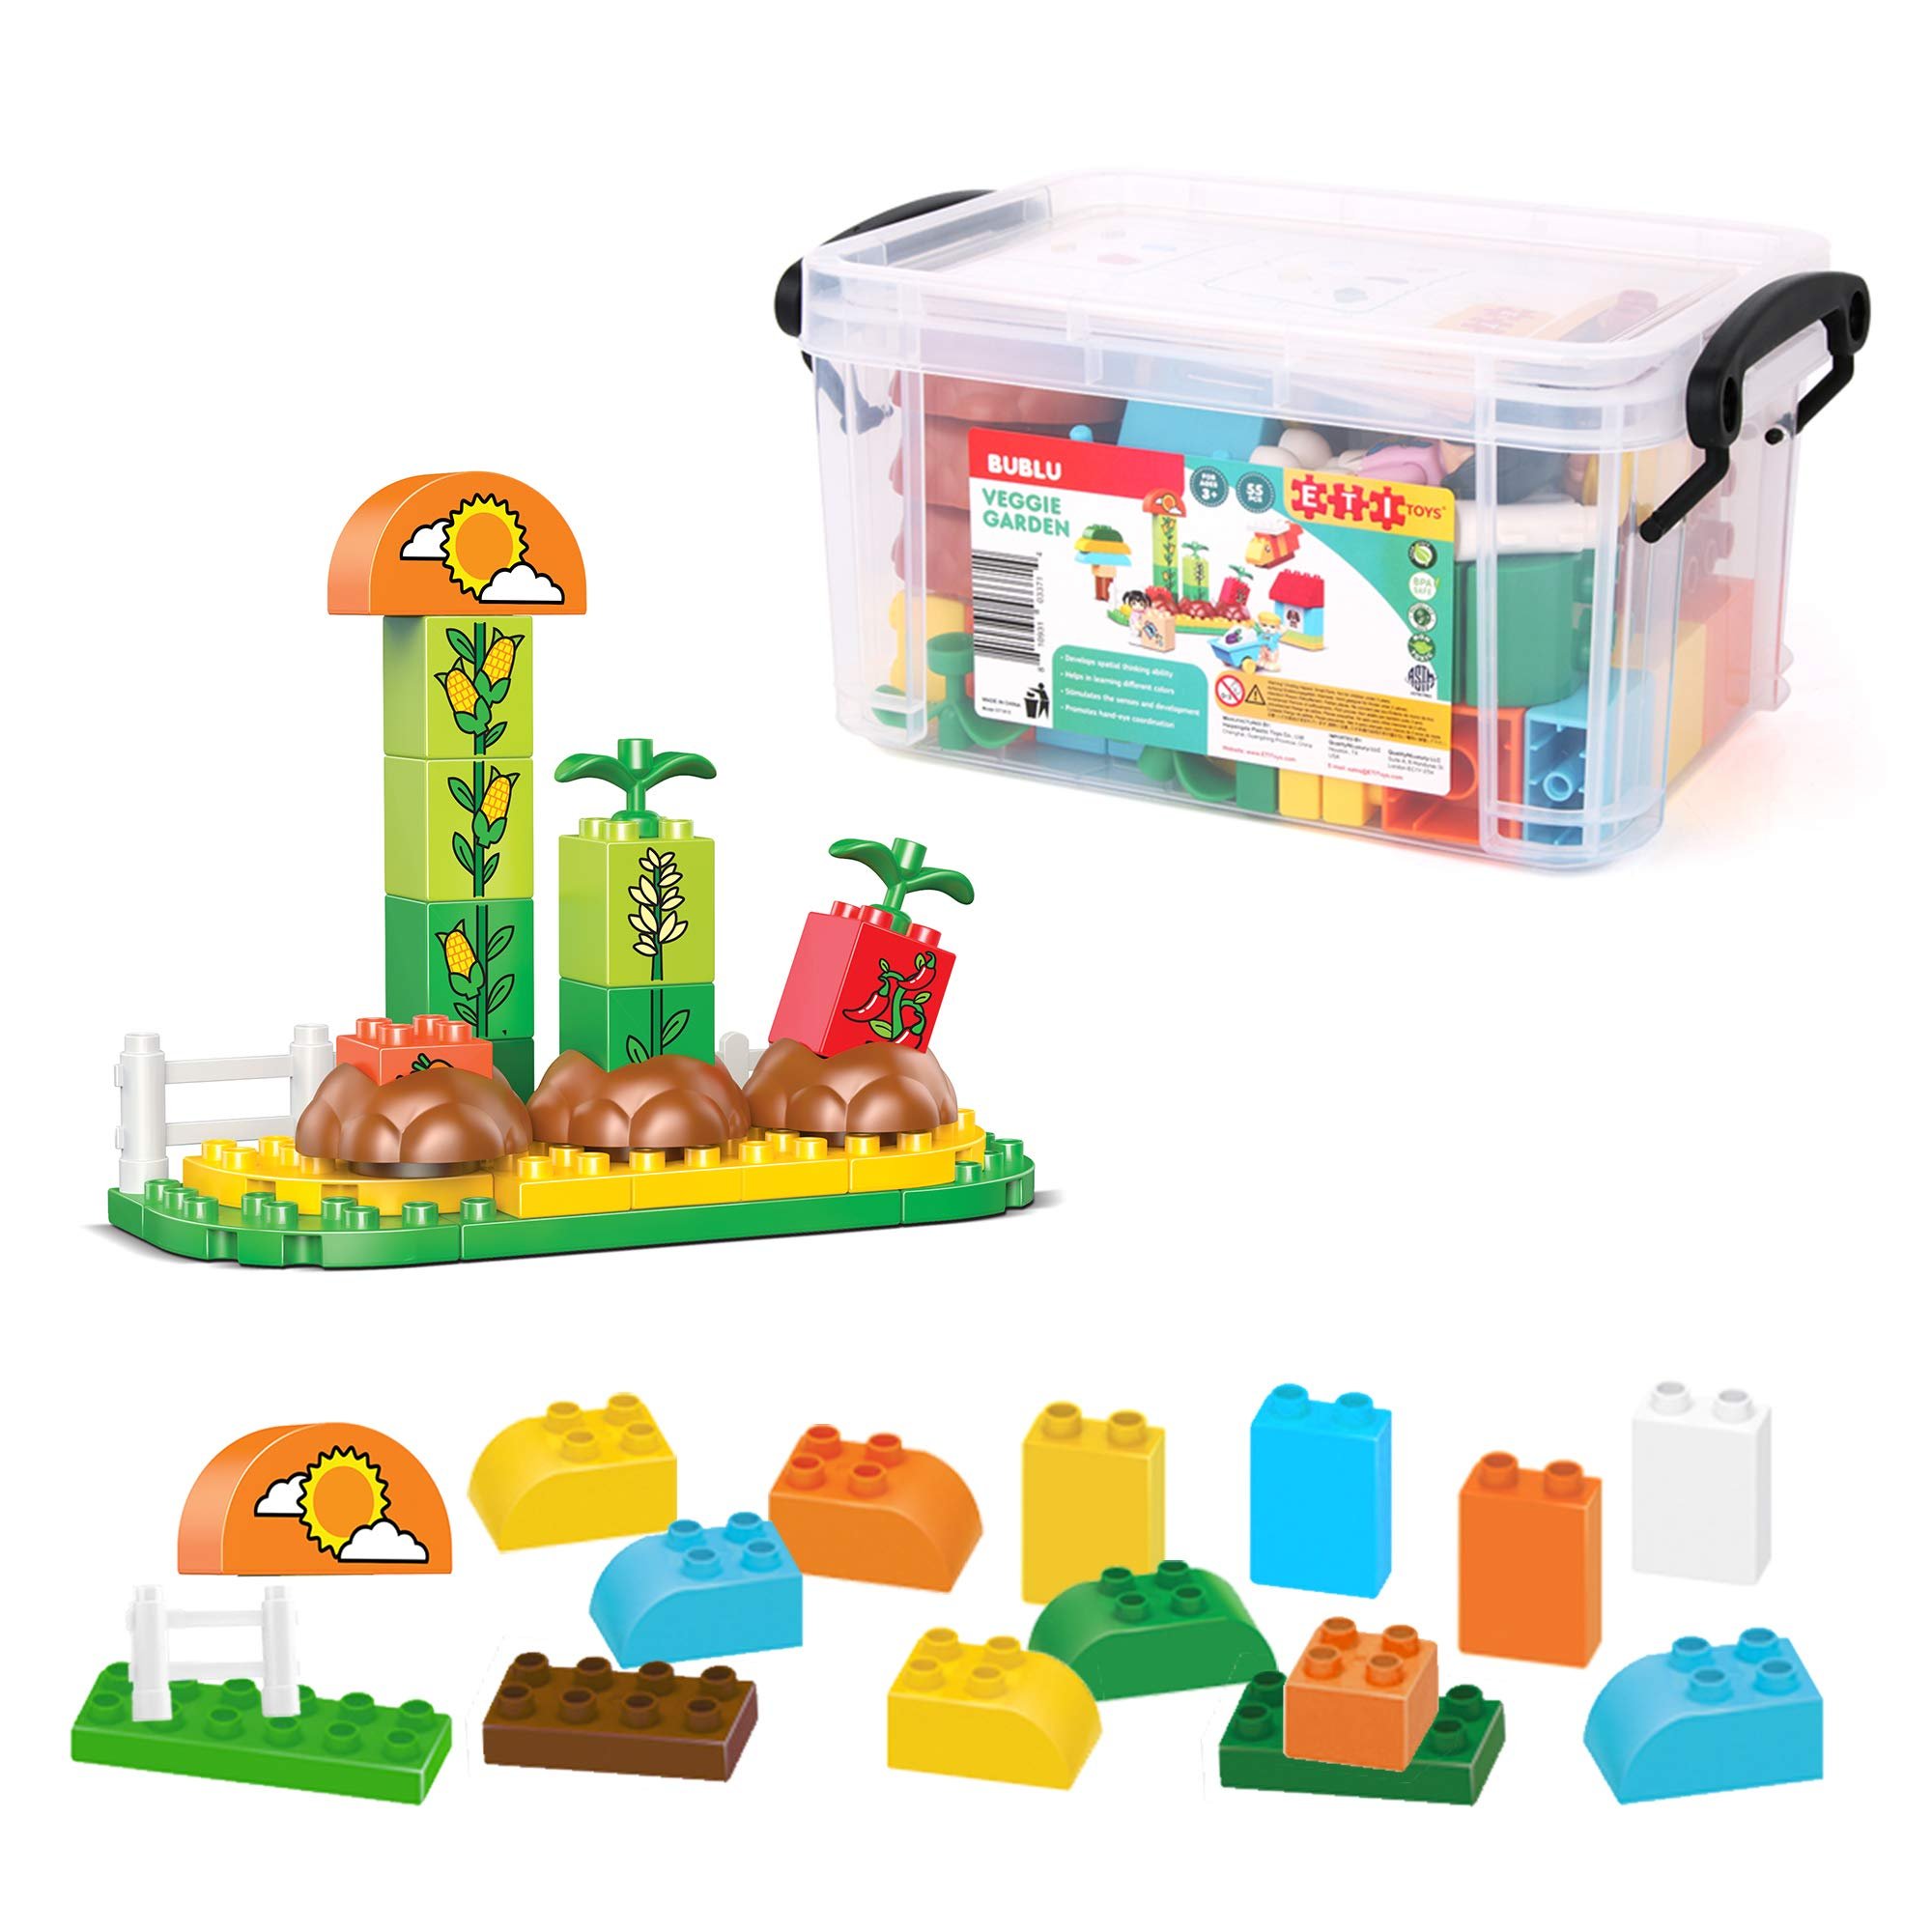 ETI Toys, 55 Piece Bublu Veggie Garden Building Blocks. Build Kitchen Garden, Doghouse, Plants, Barrow. 100 Percent Safe, Creative Skills Development. Toy Gift for 3, 4, 5 Year Old Boys and Girls